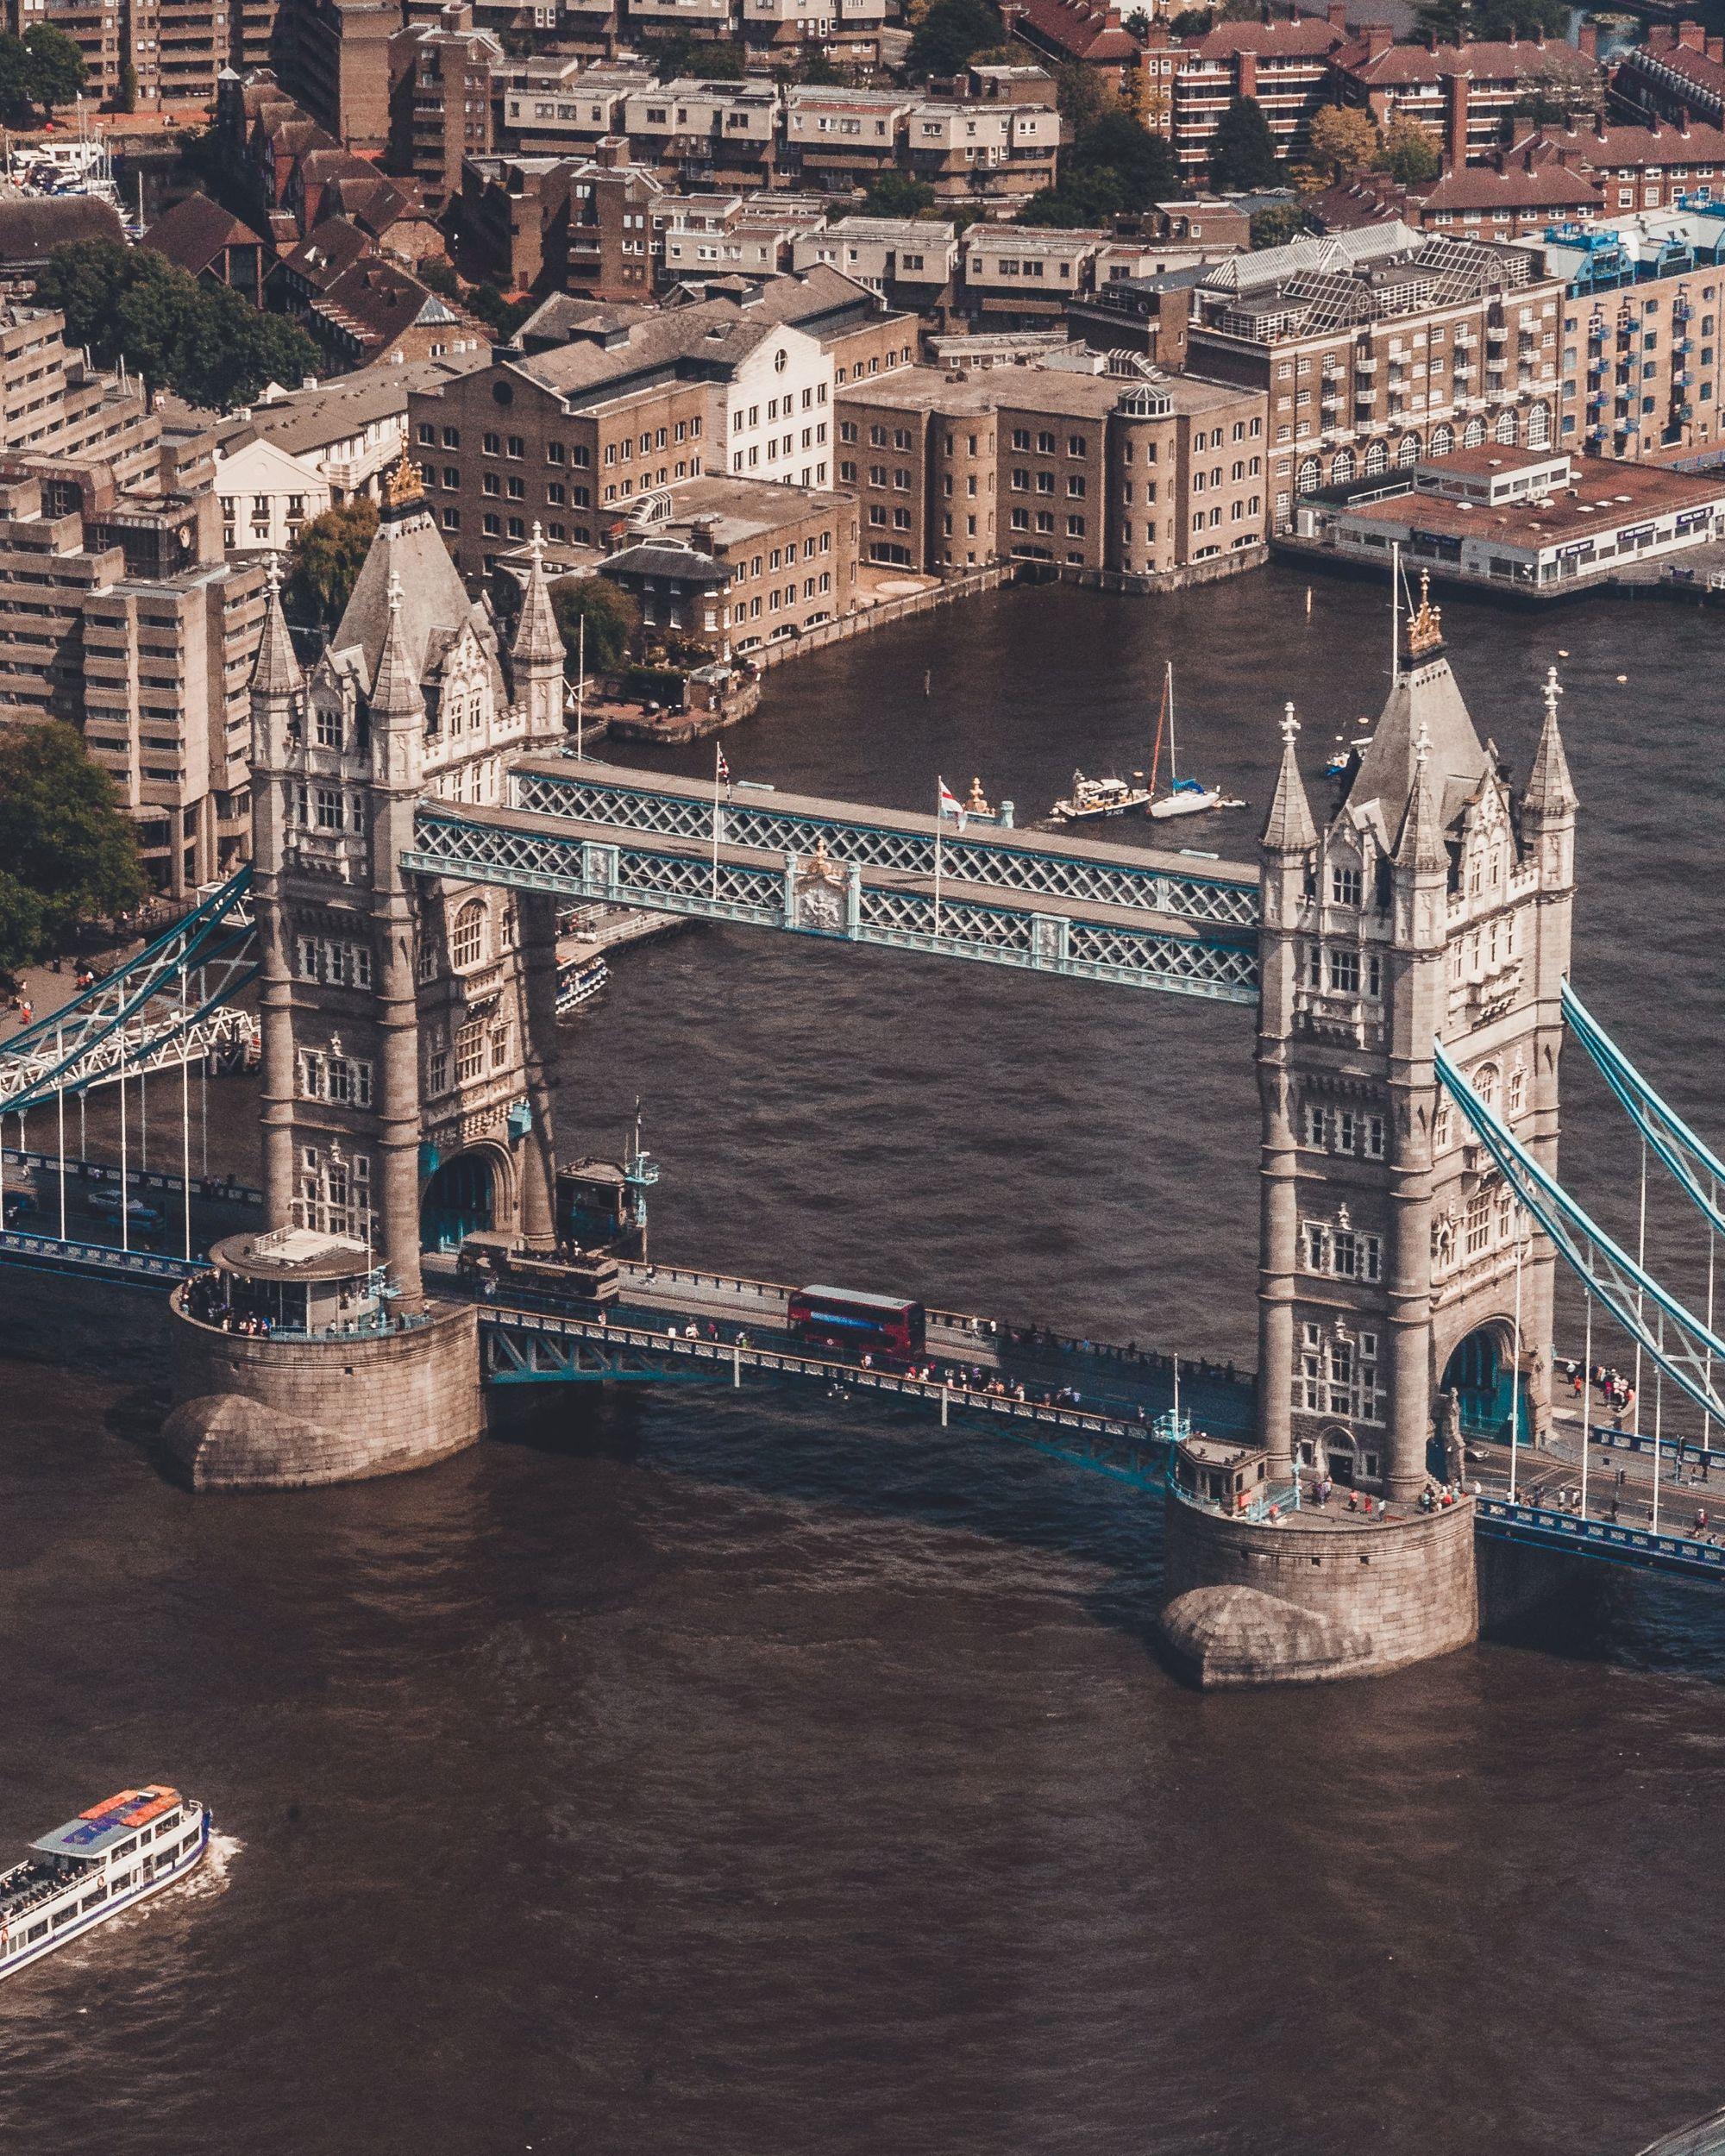 Tower bridge drone shot